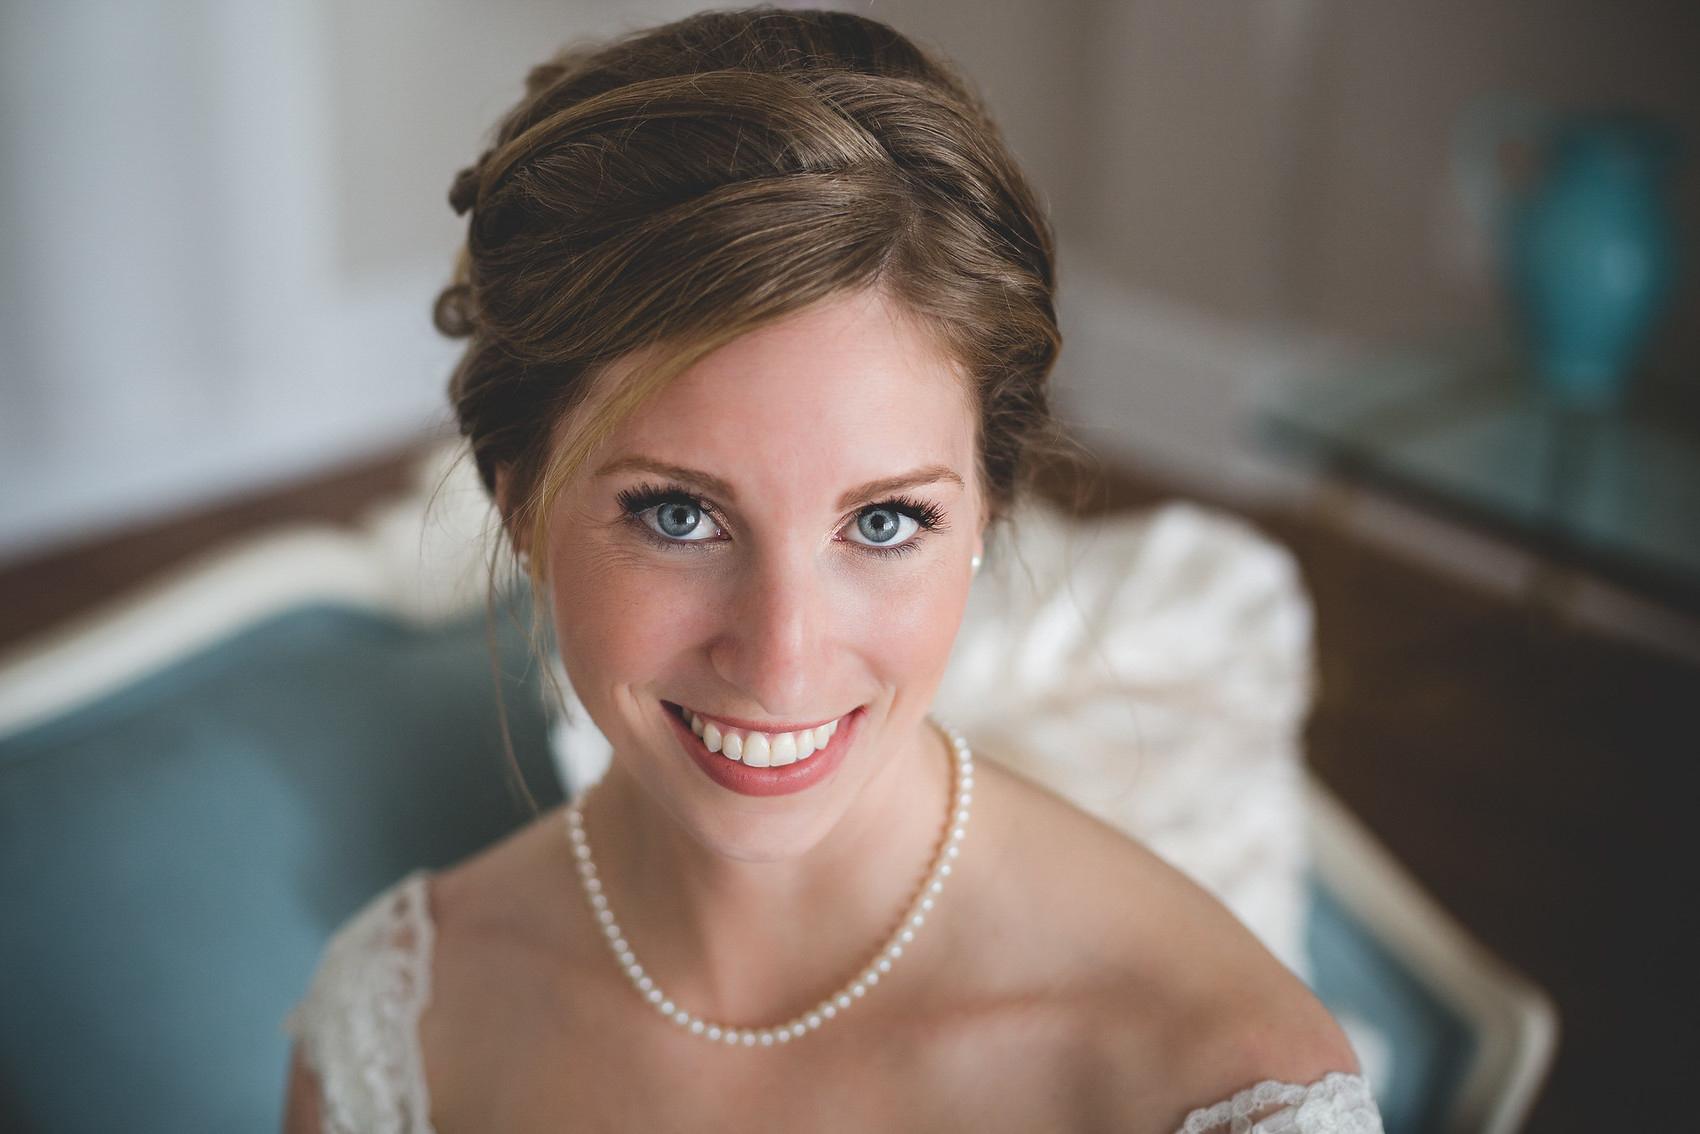 Adam-Szrmack-Bowing-the-white-room-st-augustine-wedding-photographer-27.jpg